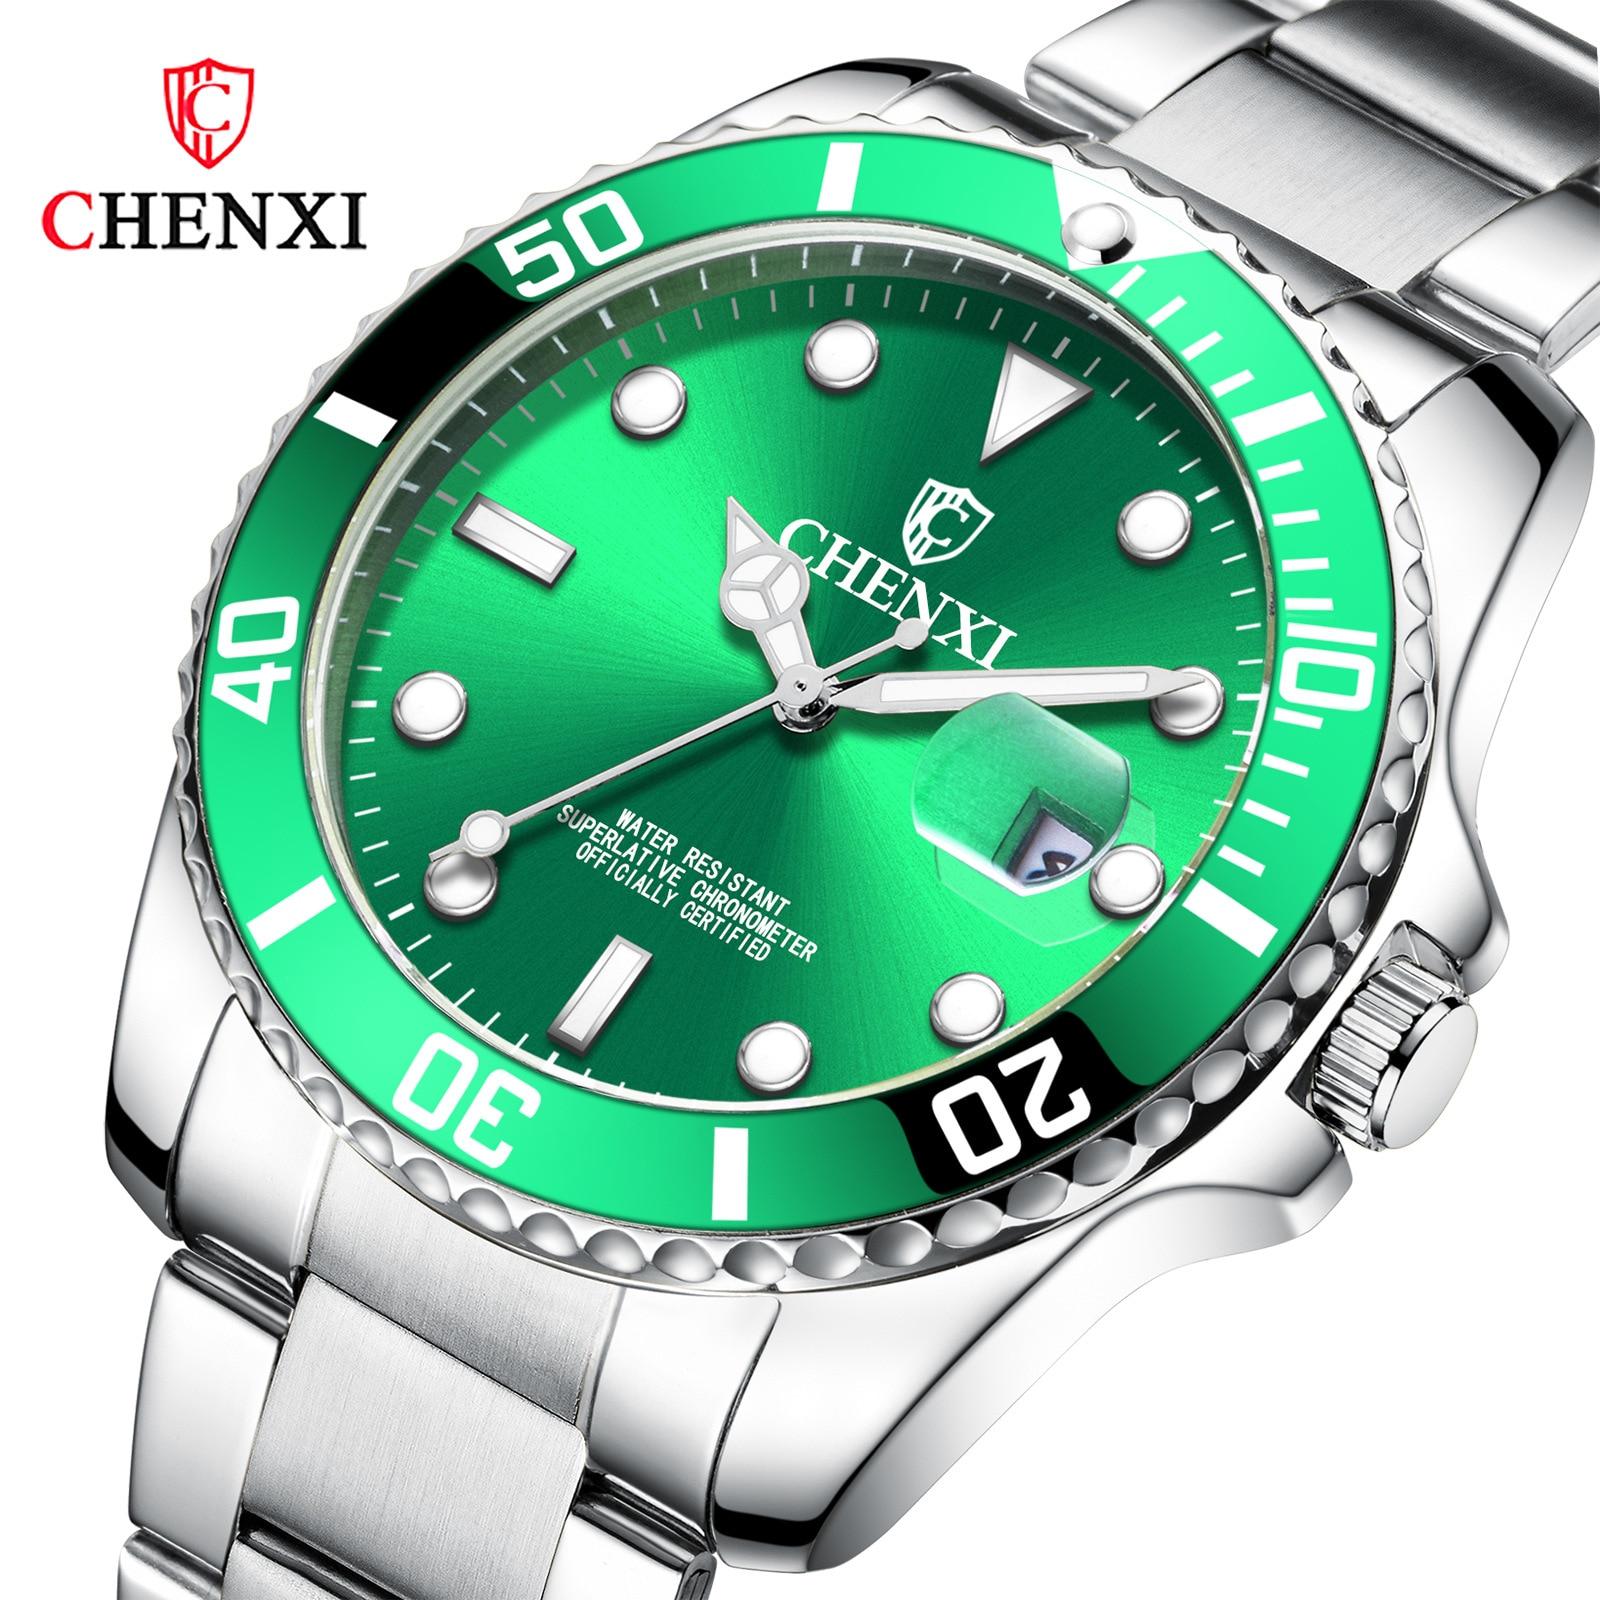 Fashionable Fashionable Person Watch CHENXI Brand Waterproof Couple Watch Douyin Hot Style Water Ghost Watch Man